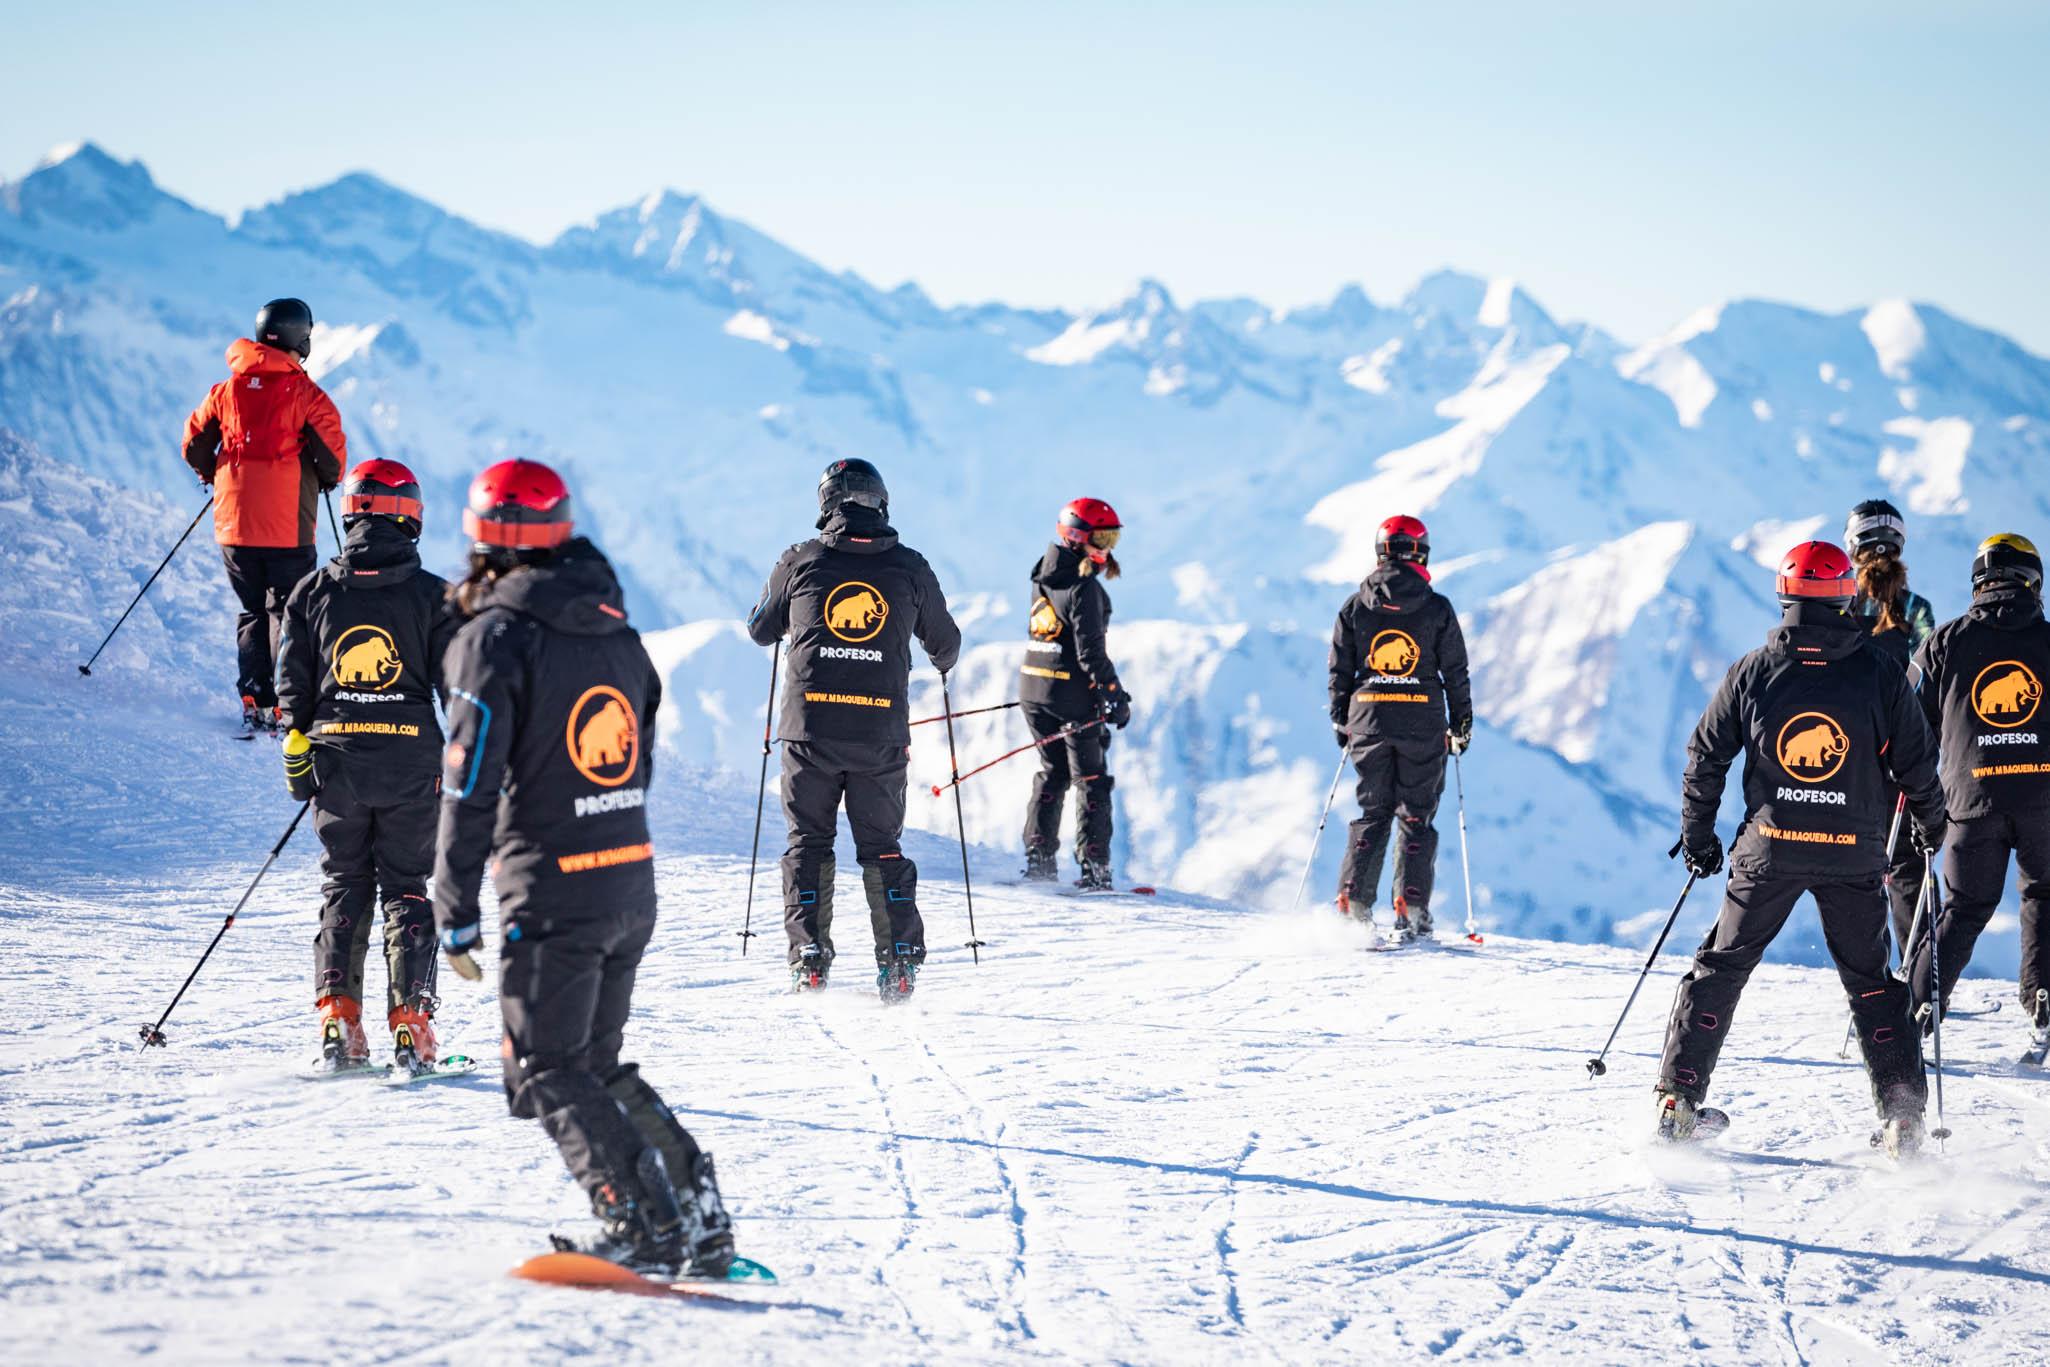 escuela esqui baqueira1